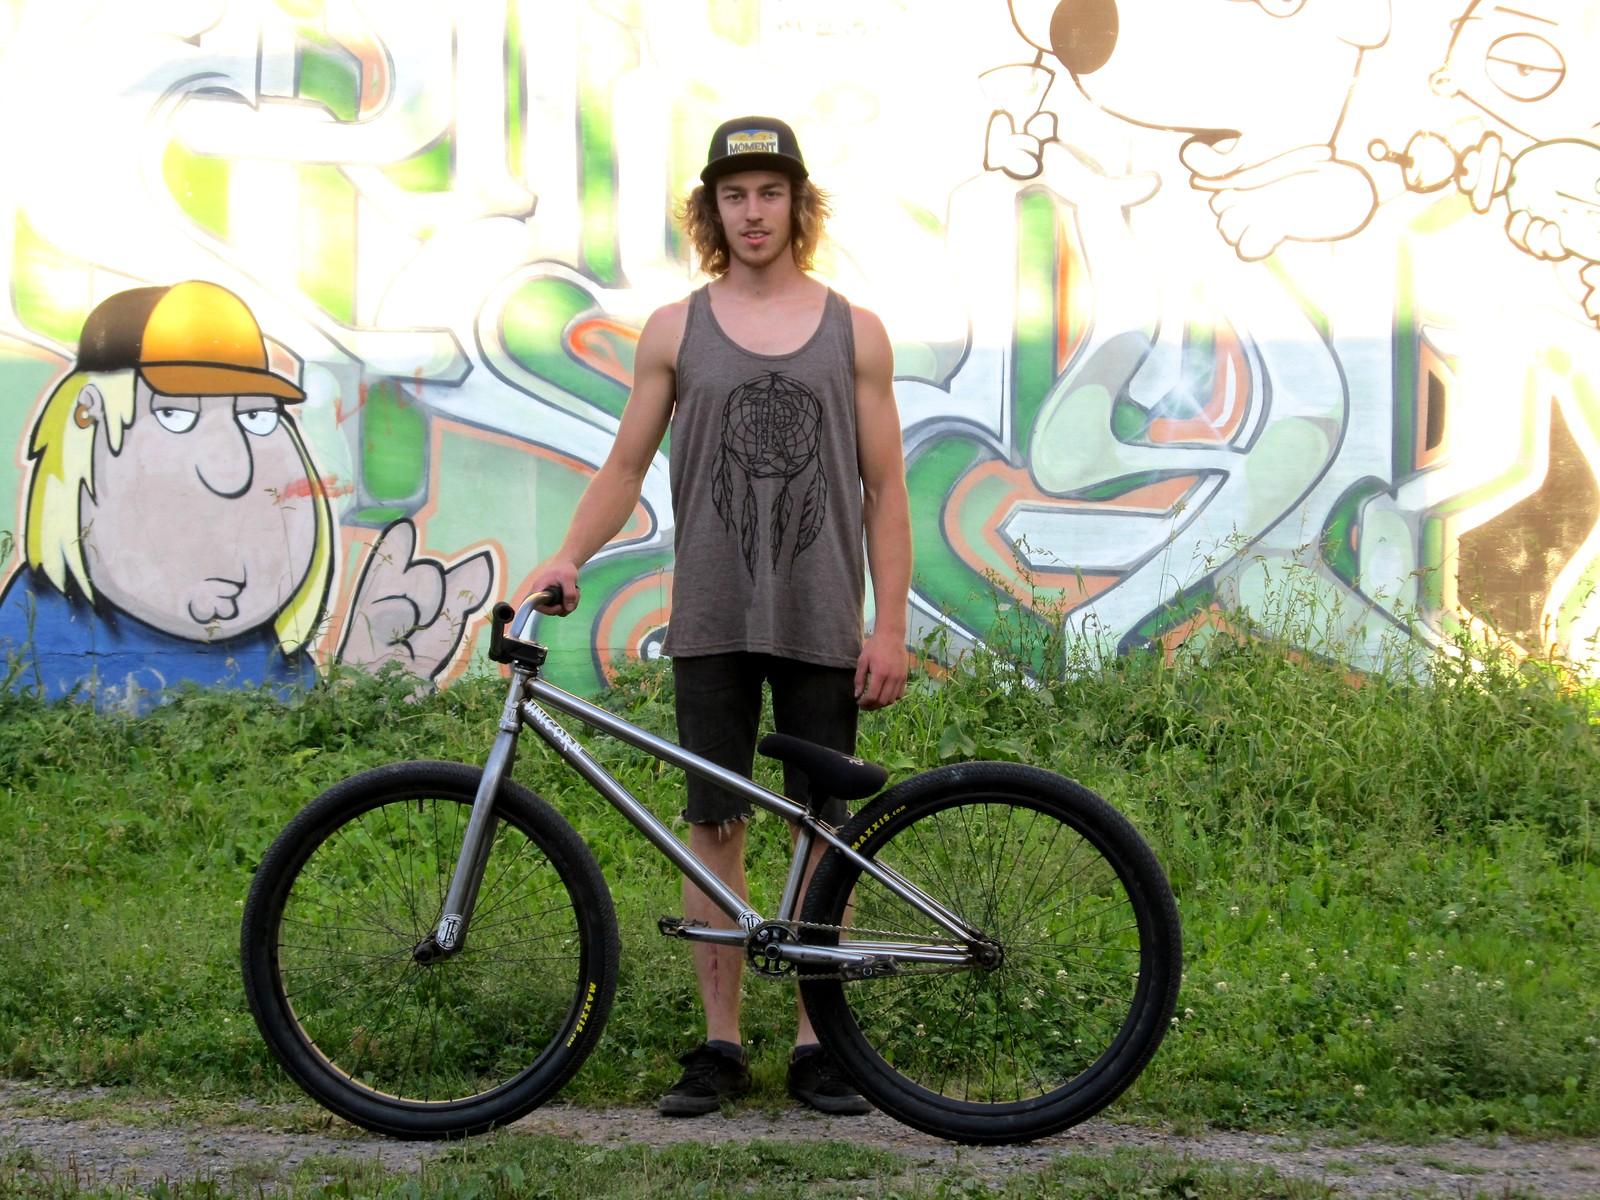 Welcome to the Team Michel Plonka! - ILLBIKE_Igor - Mountain Biking Pictures - Vital MTB